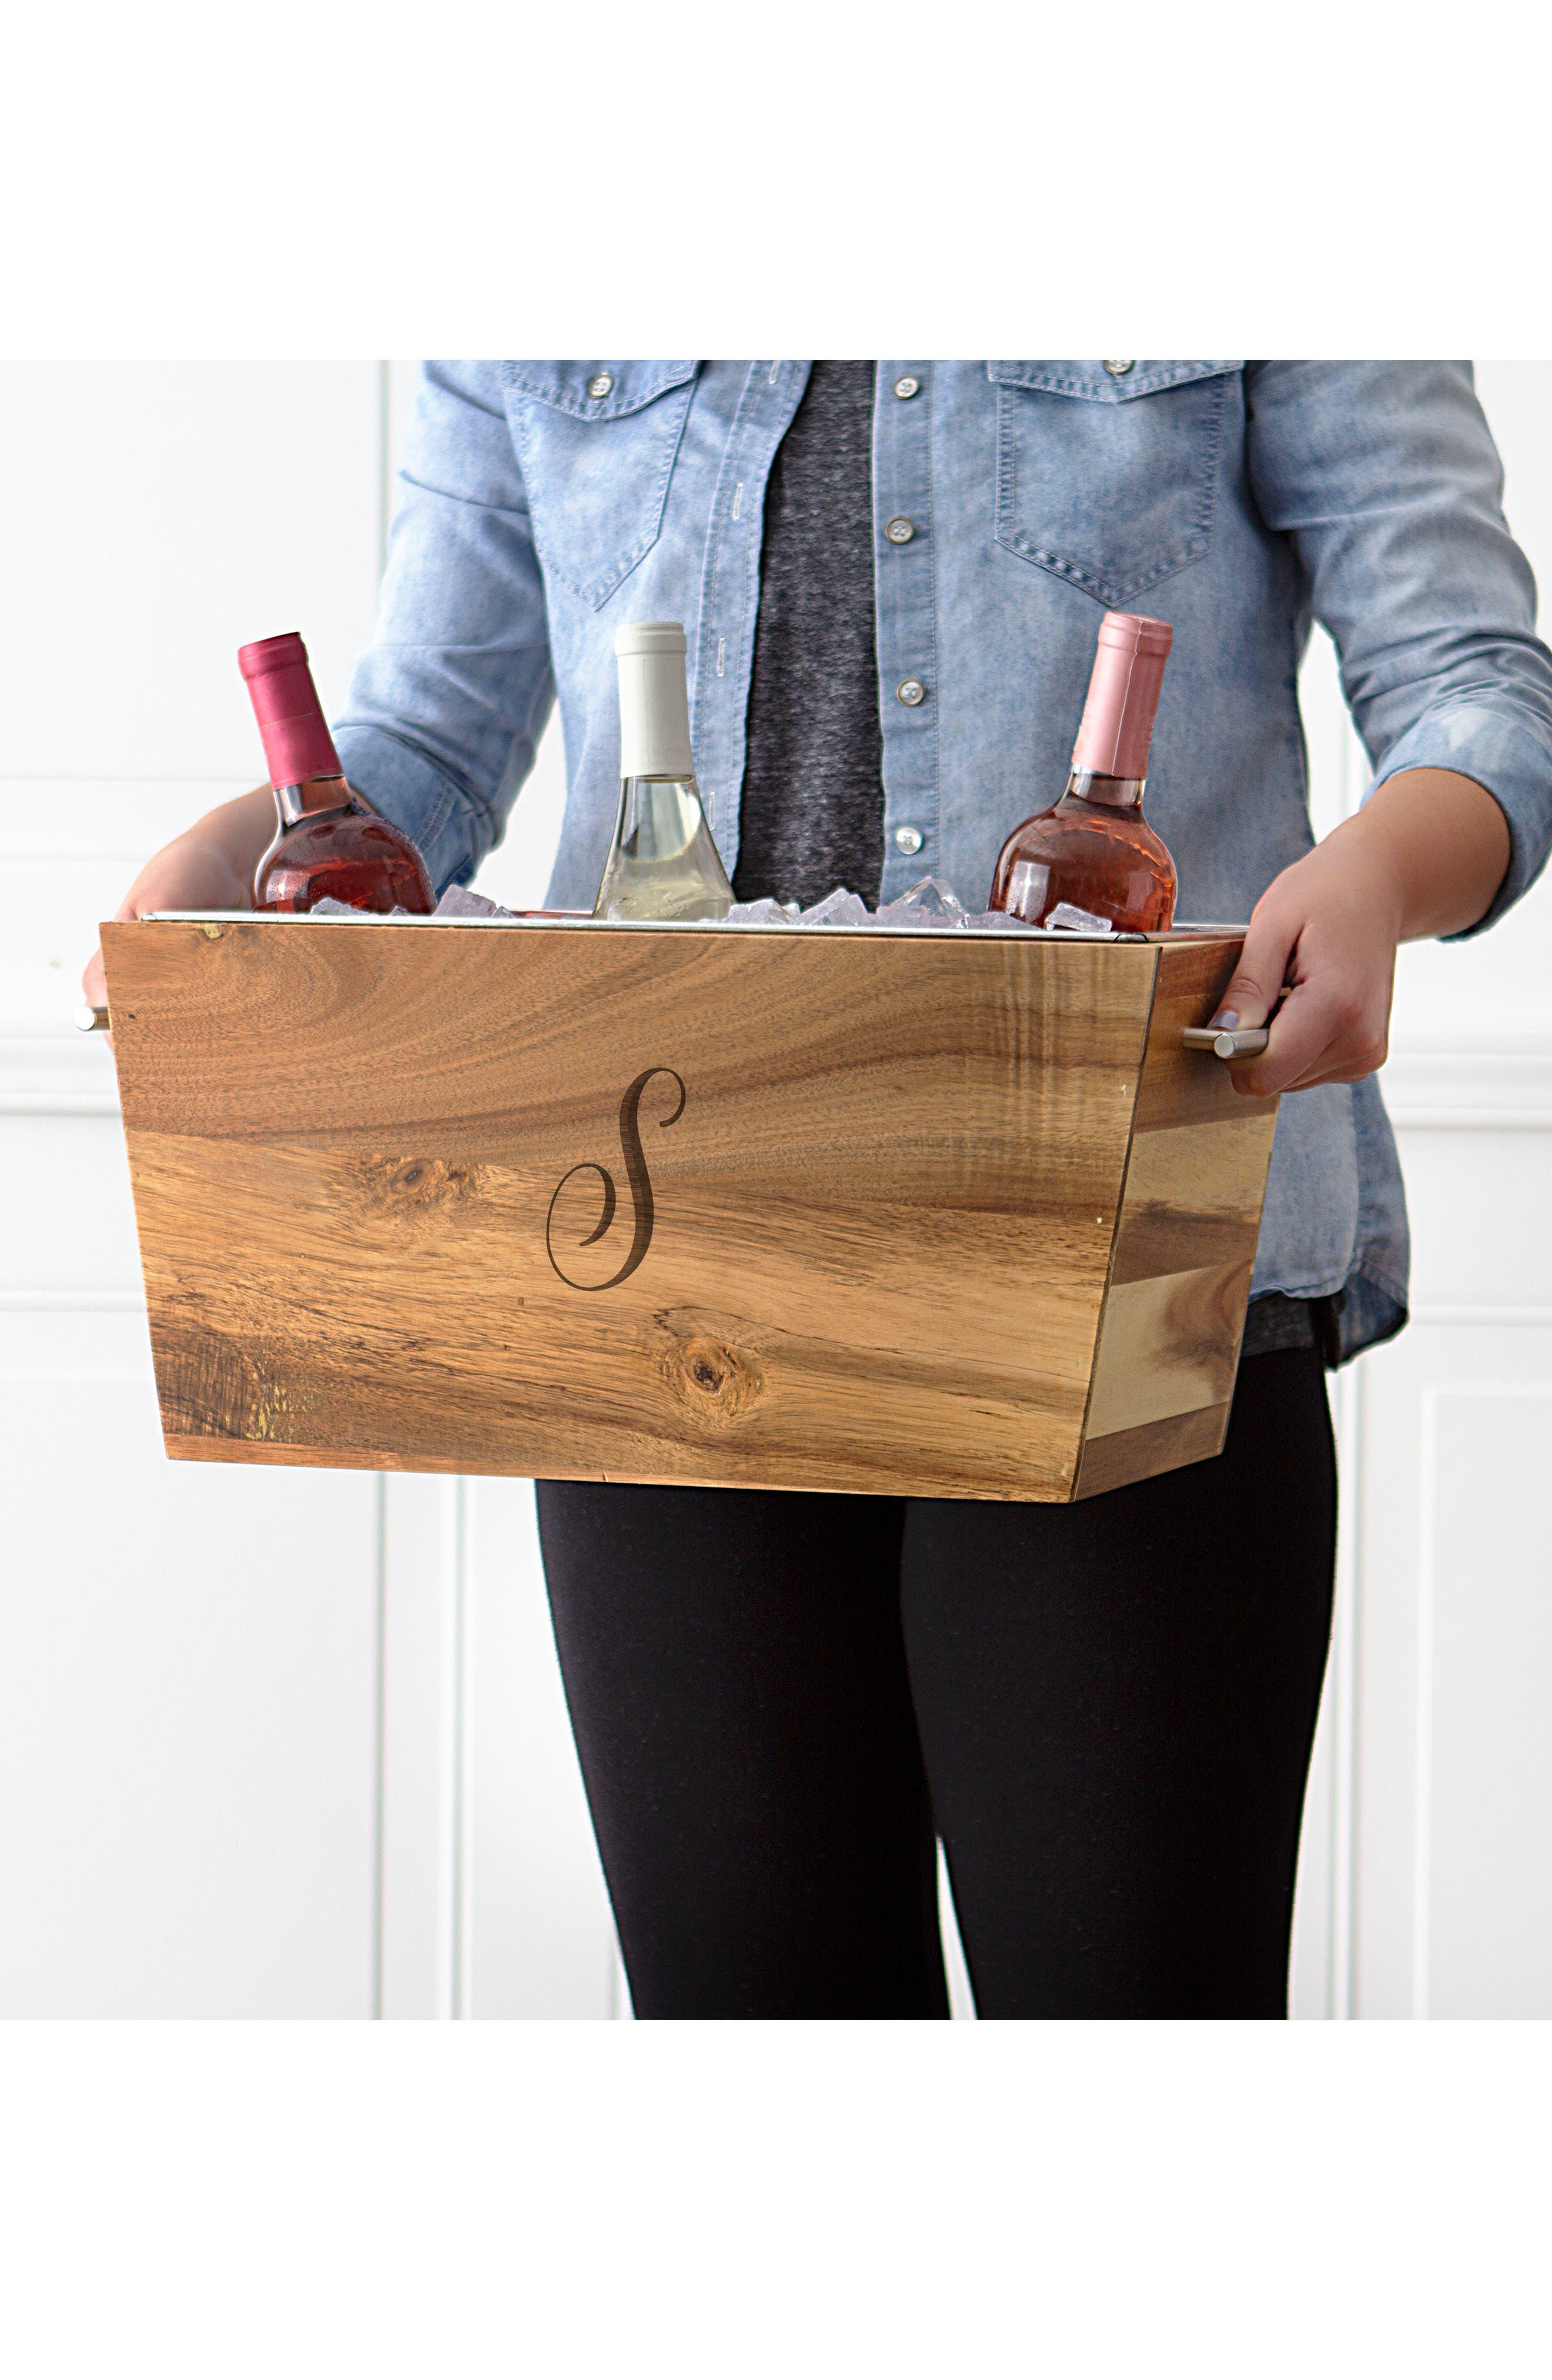 Monogram Wood Wine Trough,                             Alternate thumbnail 7, color,                             BROWN